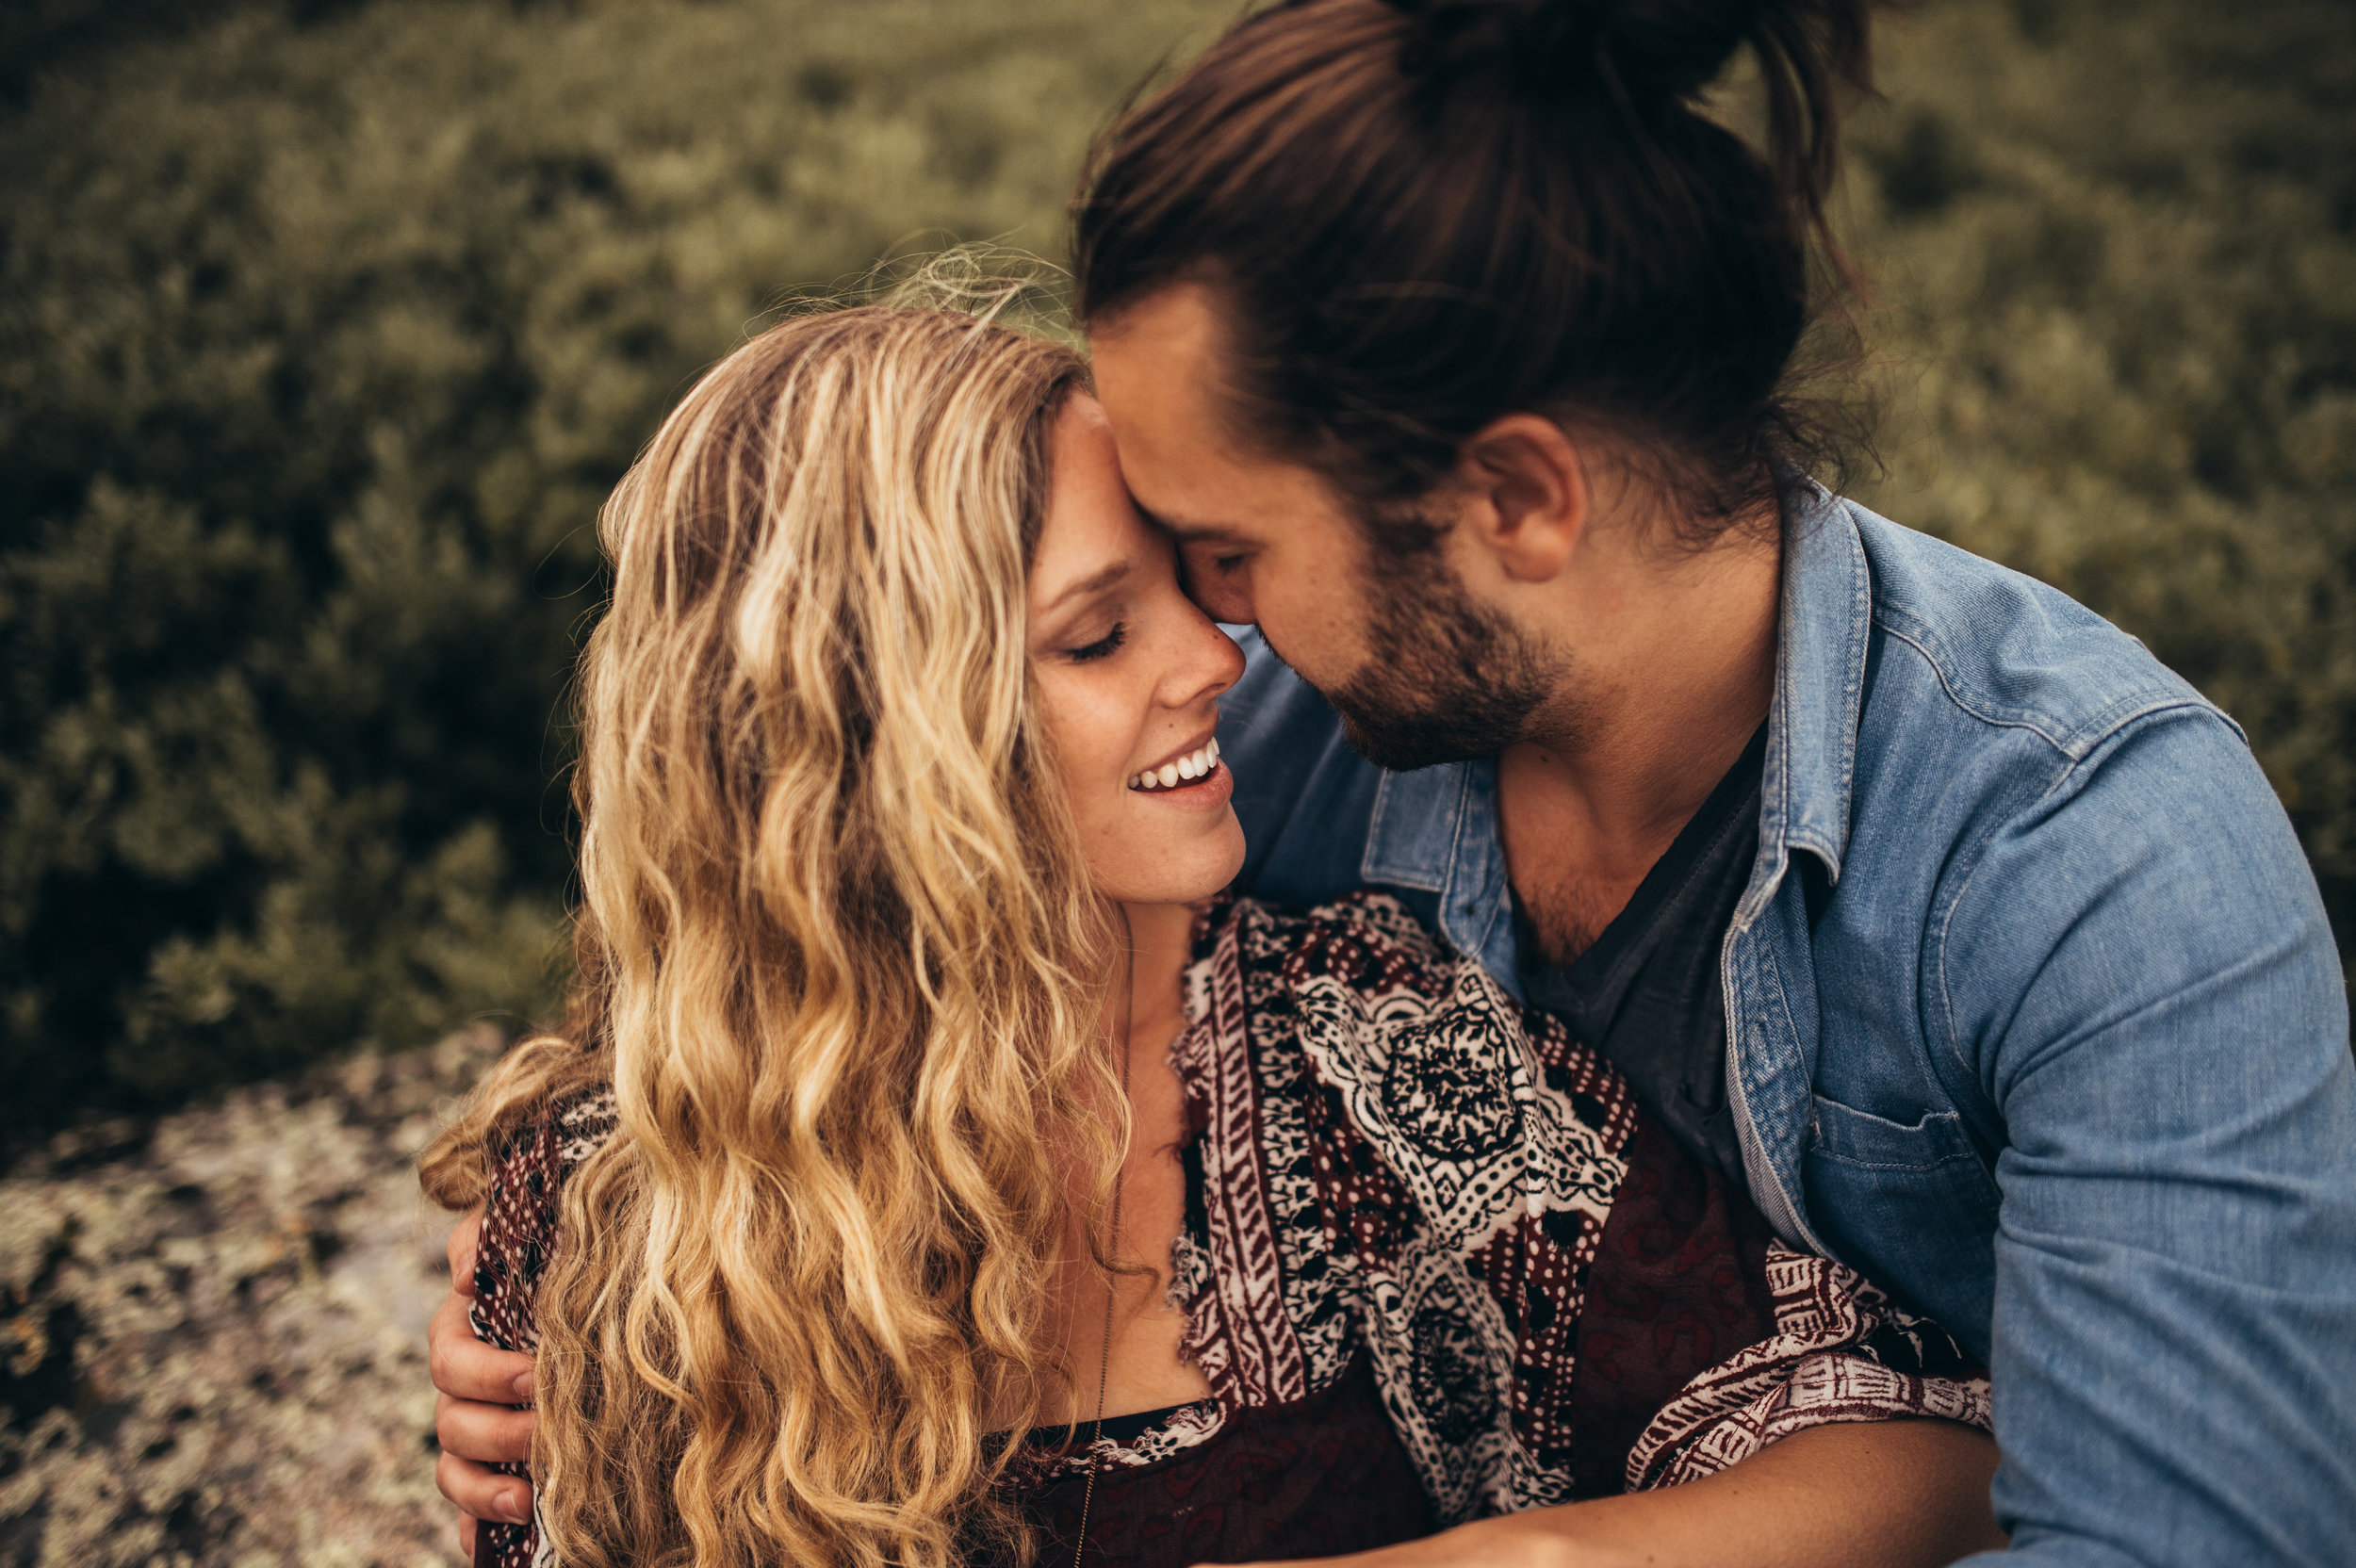 Husband and wife joyfully embracing.